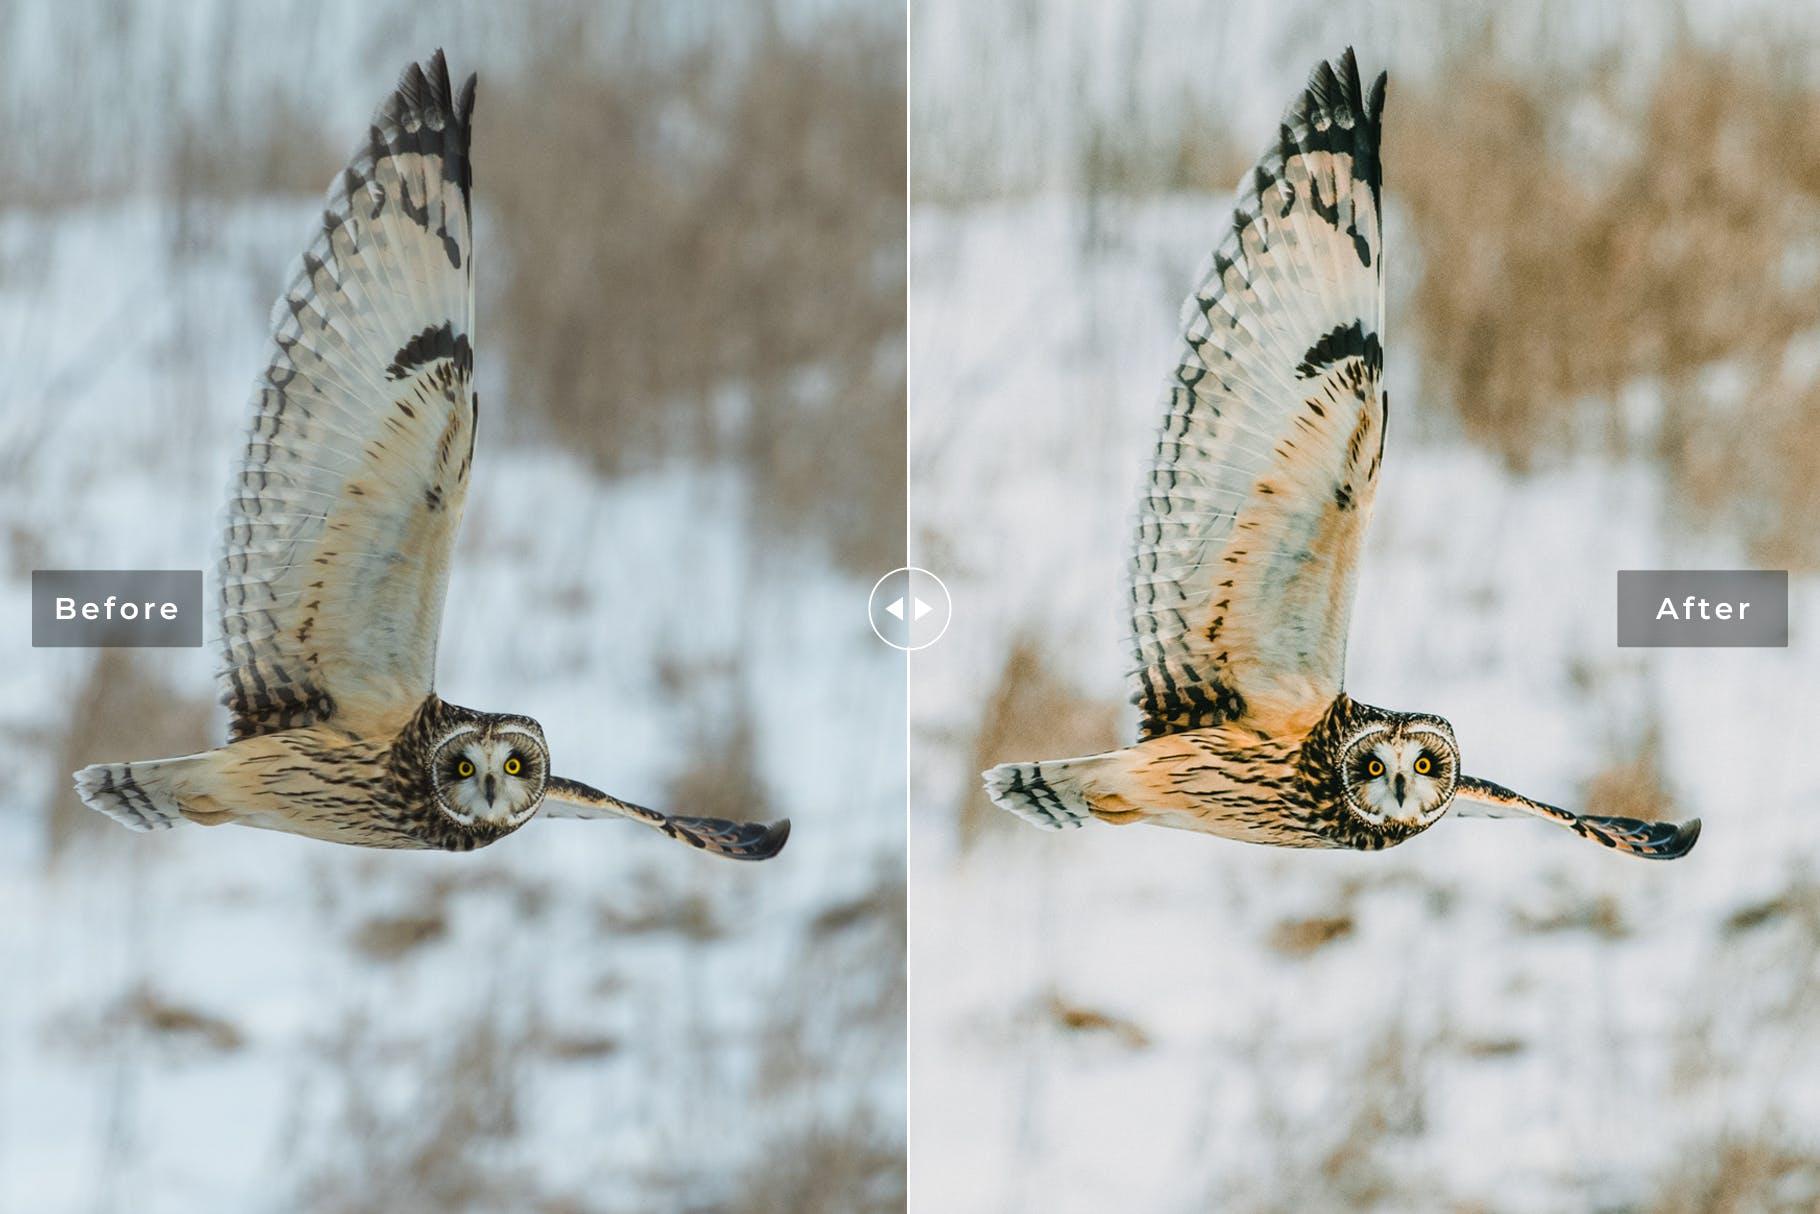 鸟类摄影优化照片效果处理LR预设Birds Wings Mobile Desktop Lightroom Presets插图(3)